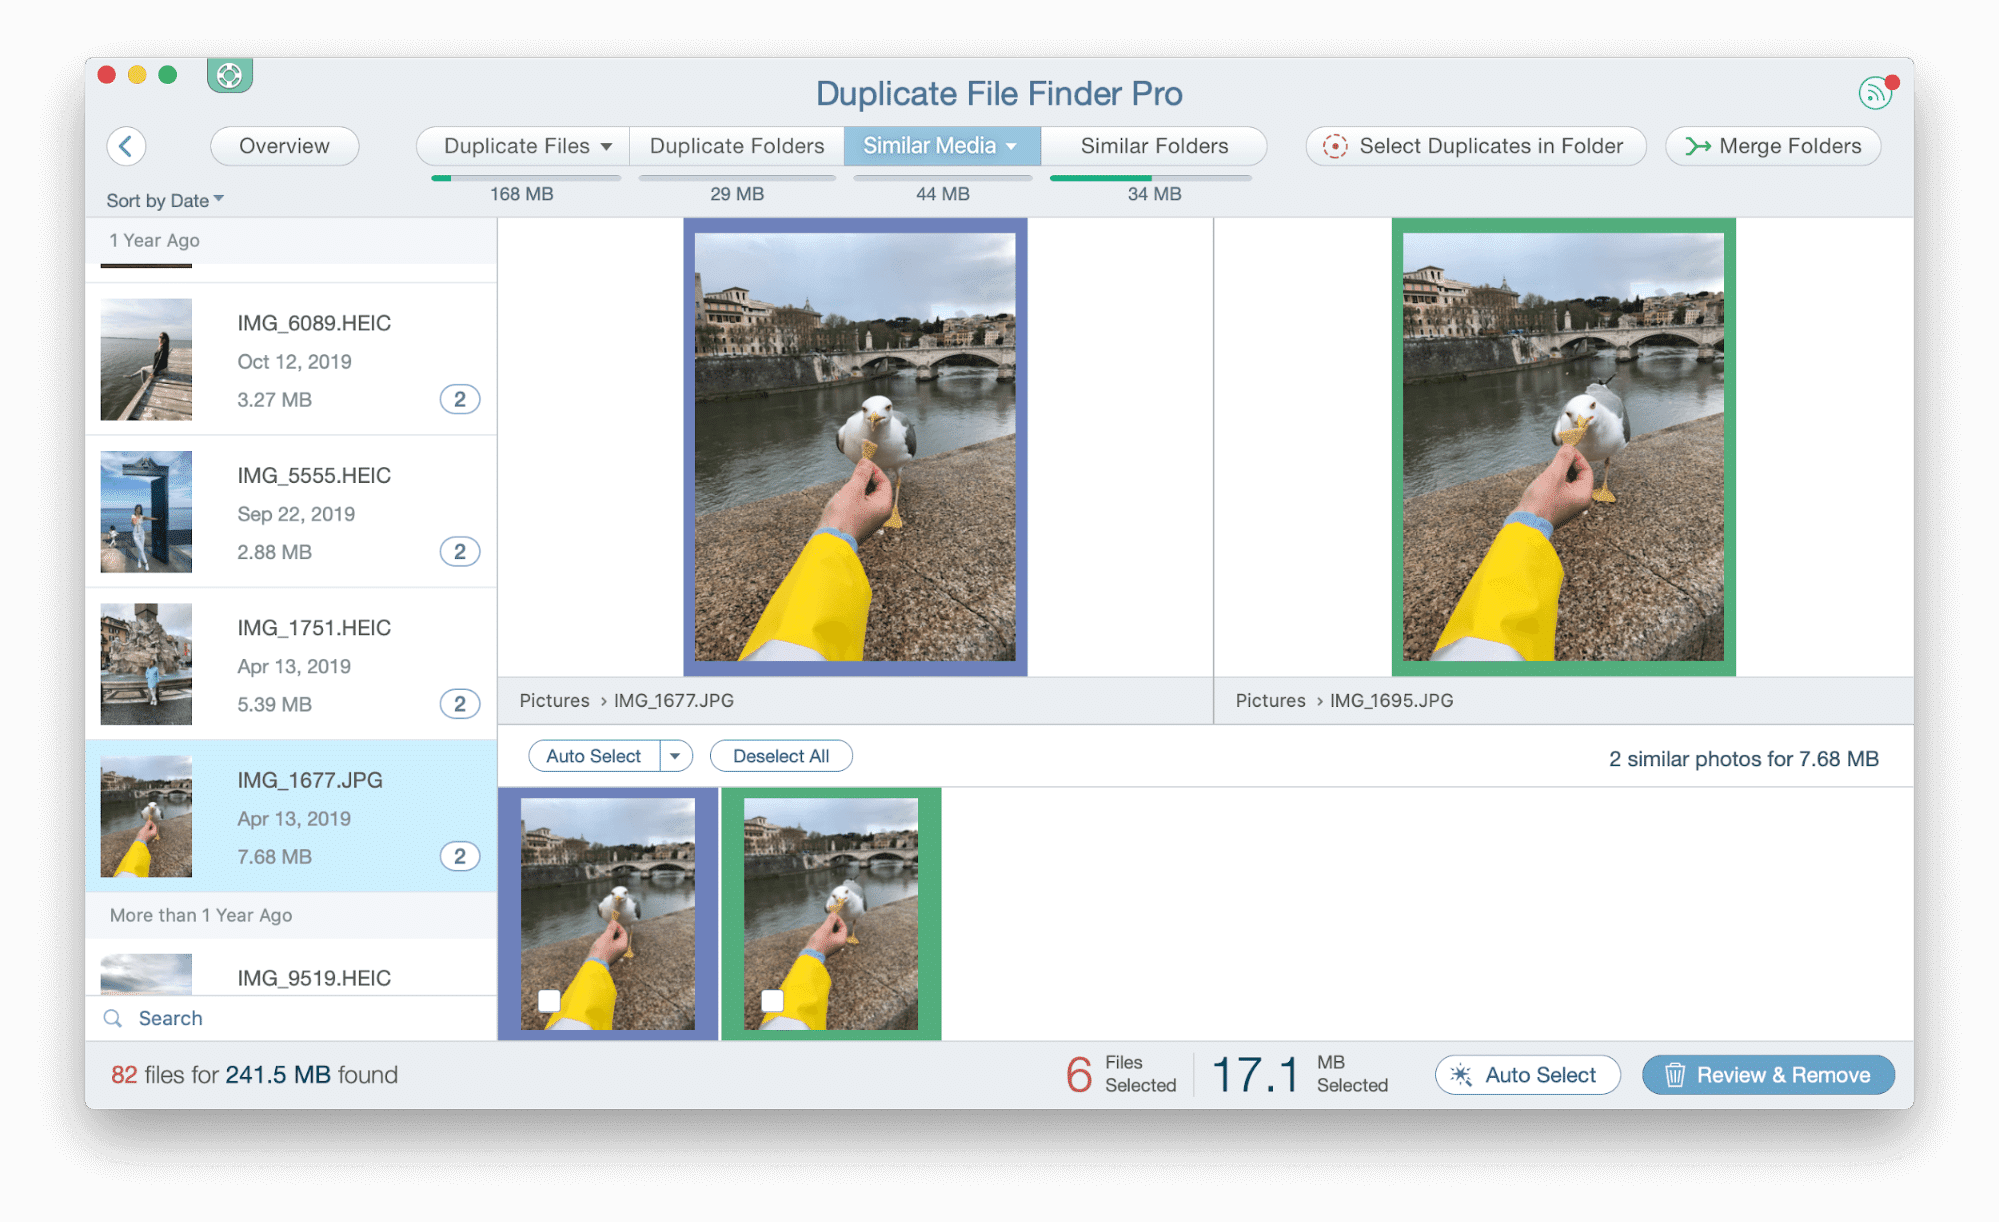 Similar photos are displayed in Duplicate Finder